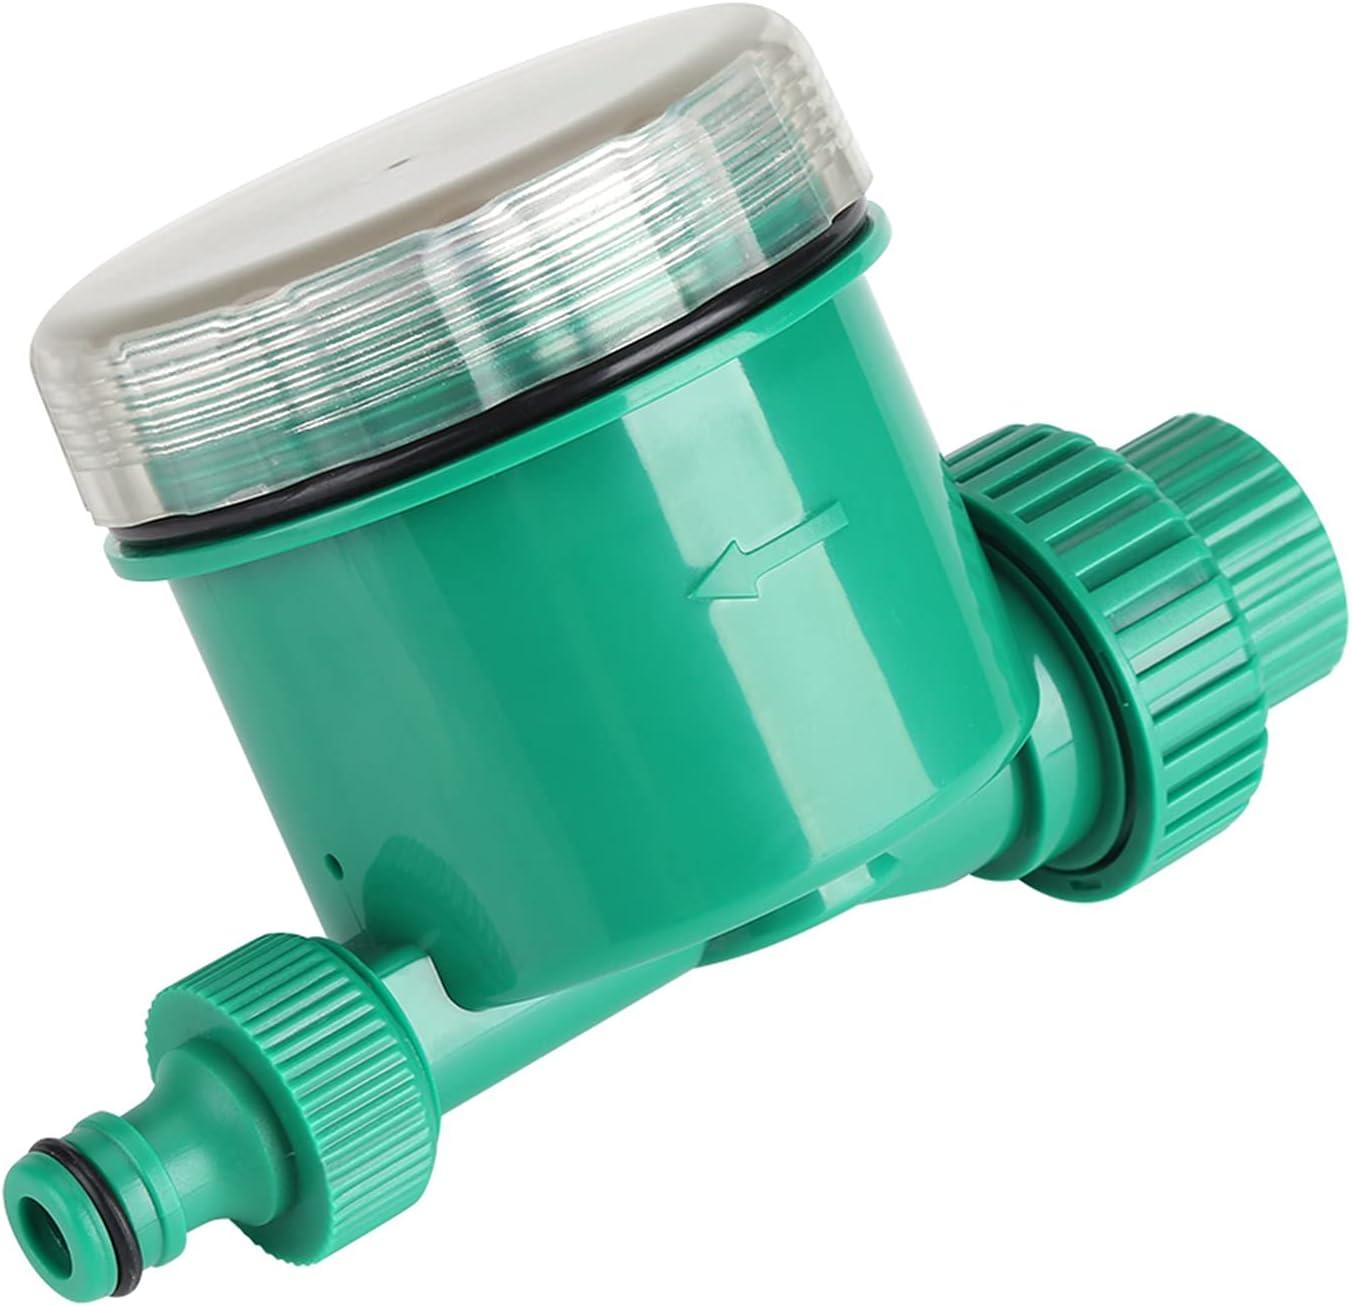 WJIN Irrigation Timer-Automatic Be super welcome Electric Garden Irrigati Digital Rapid rise